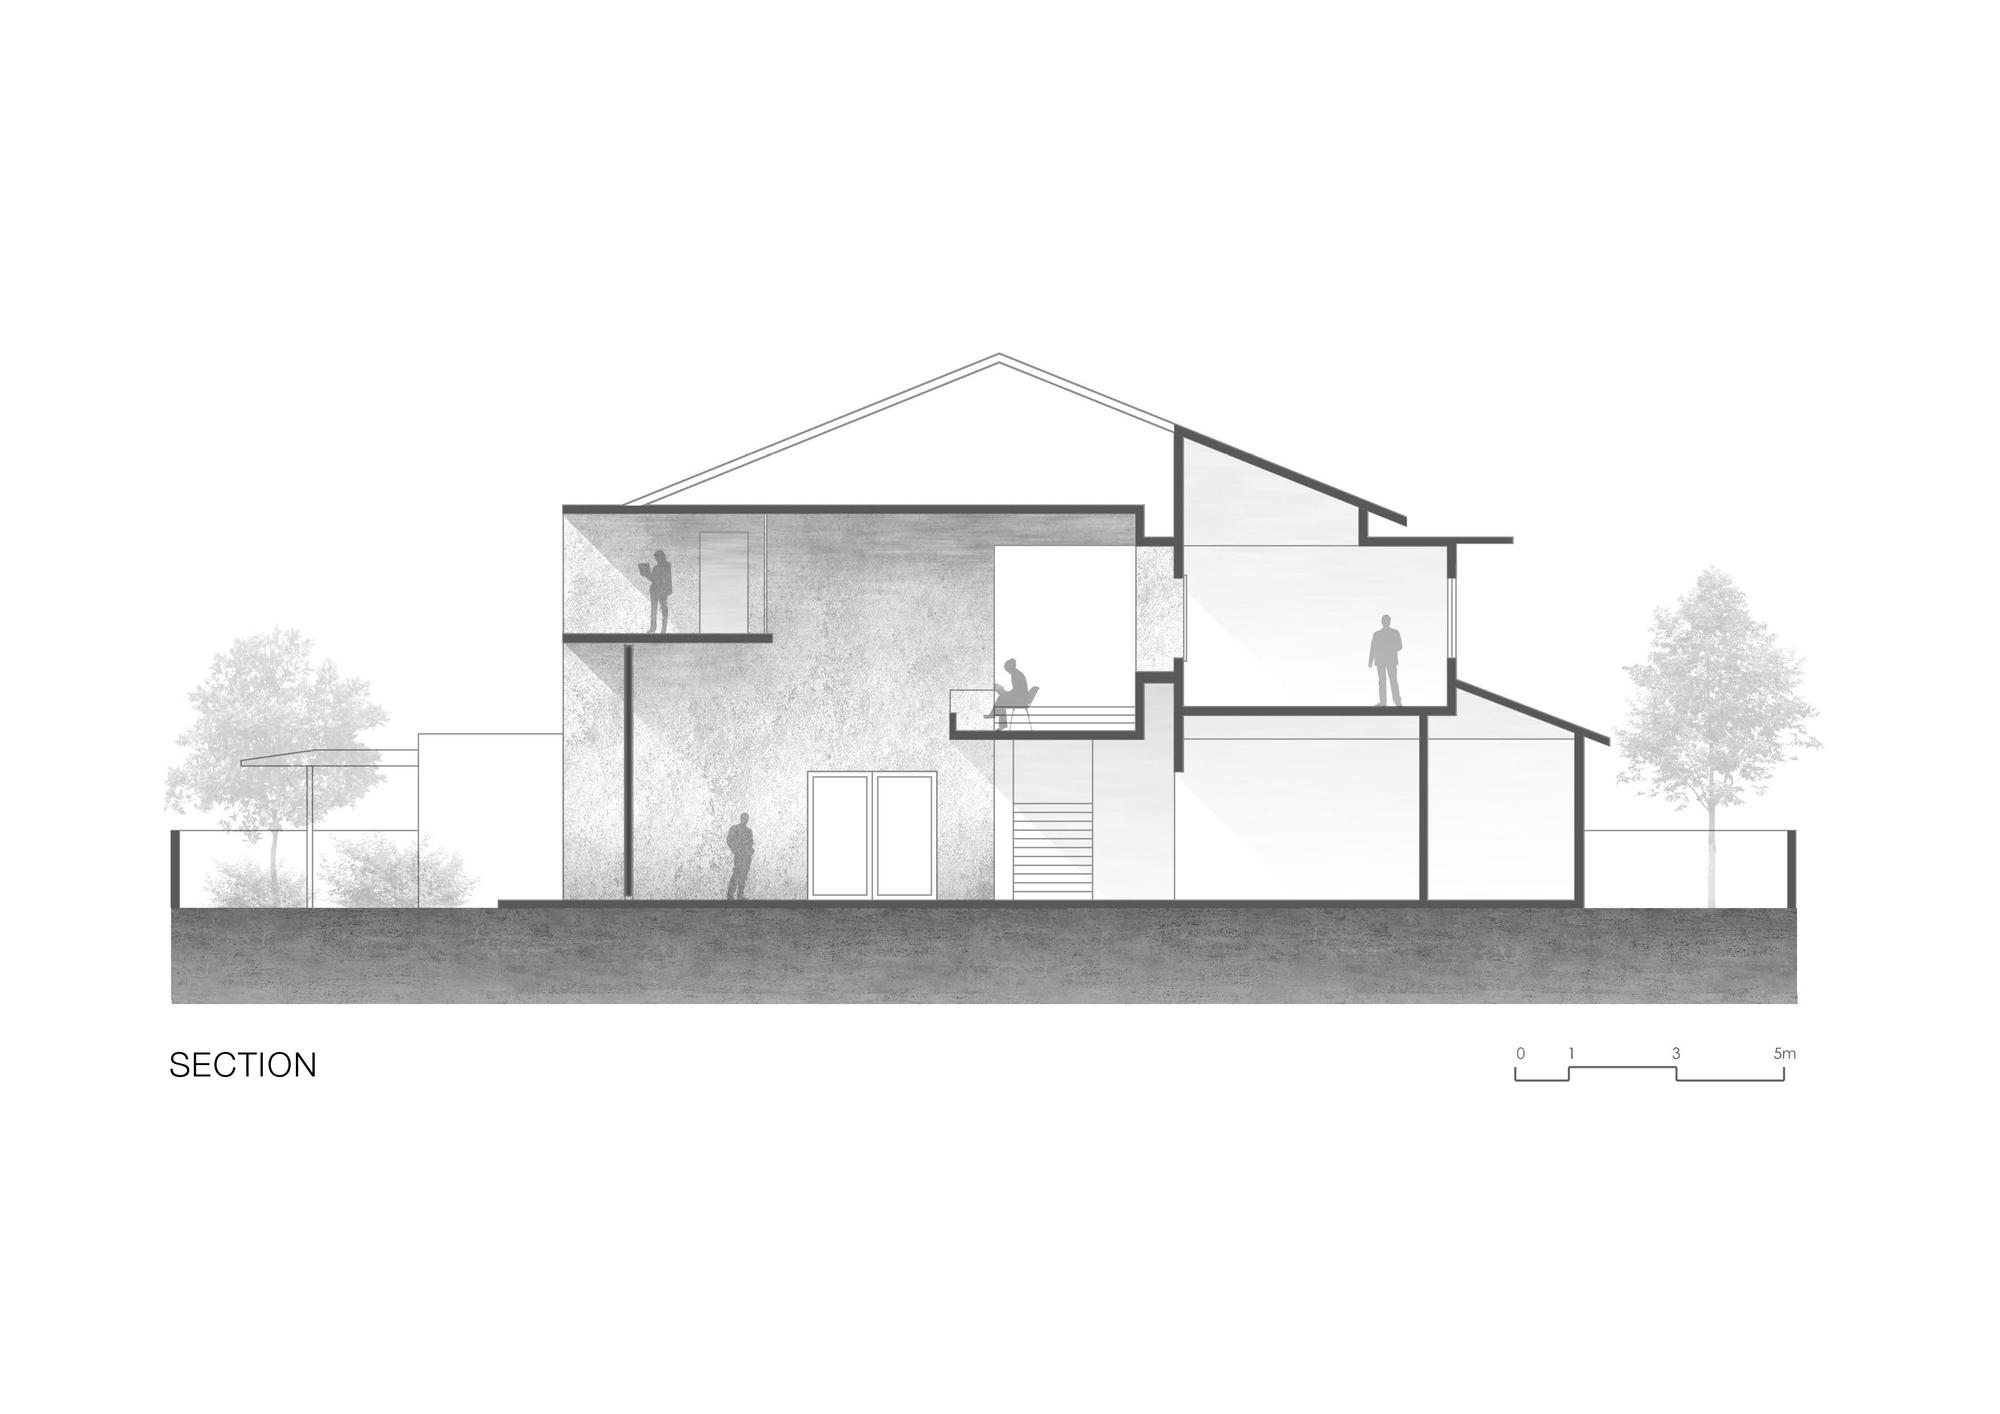 m5 _bewboc_house_drawings_w_legend-5.jpg